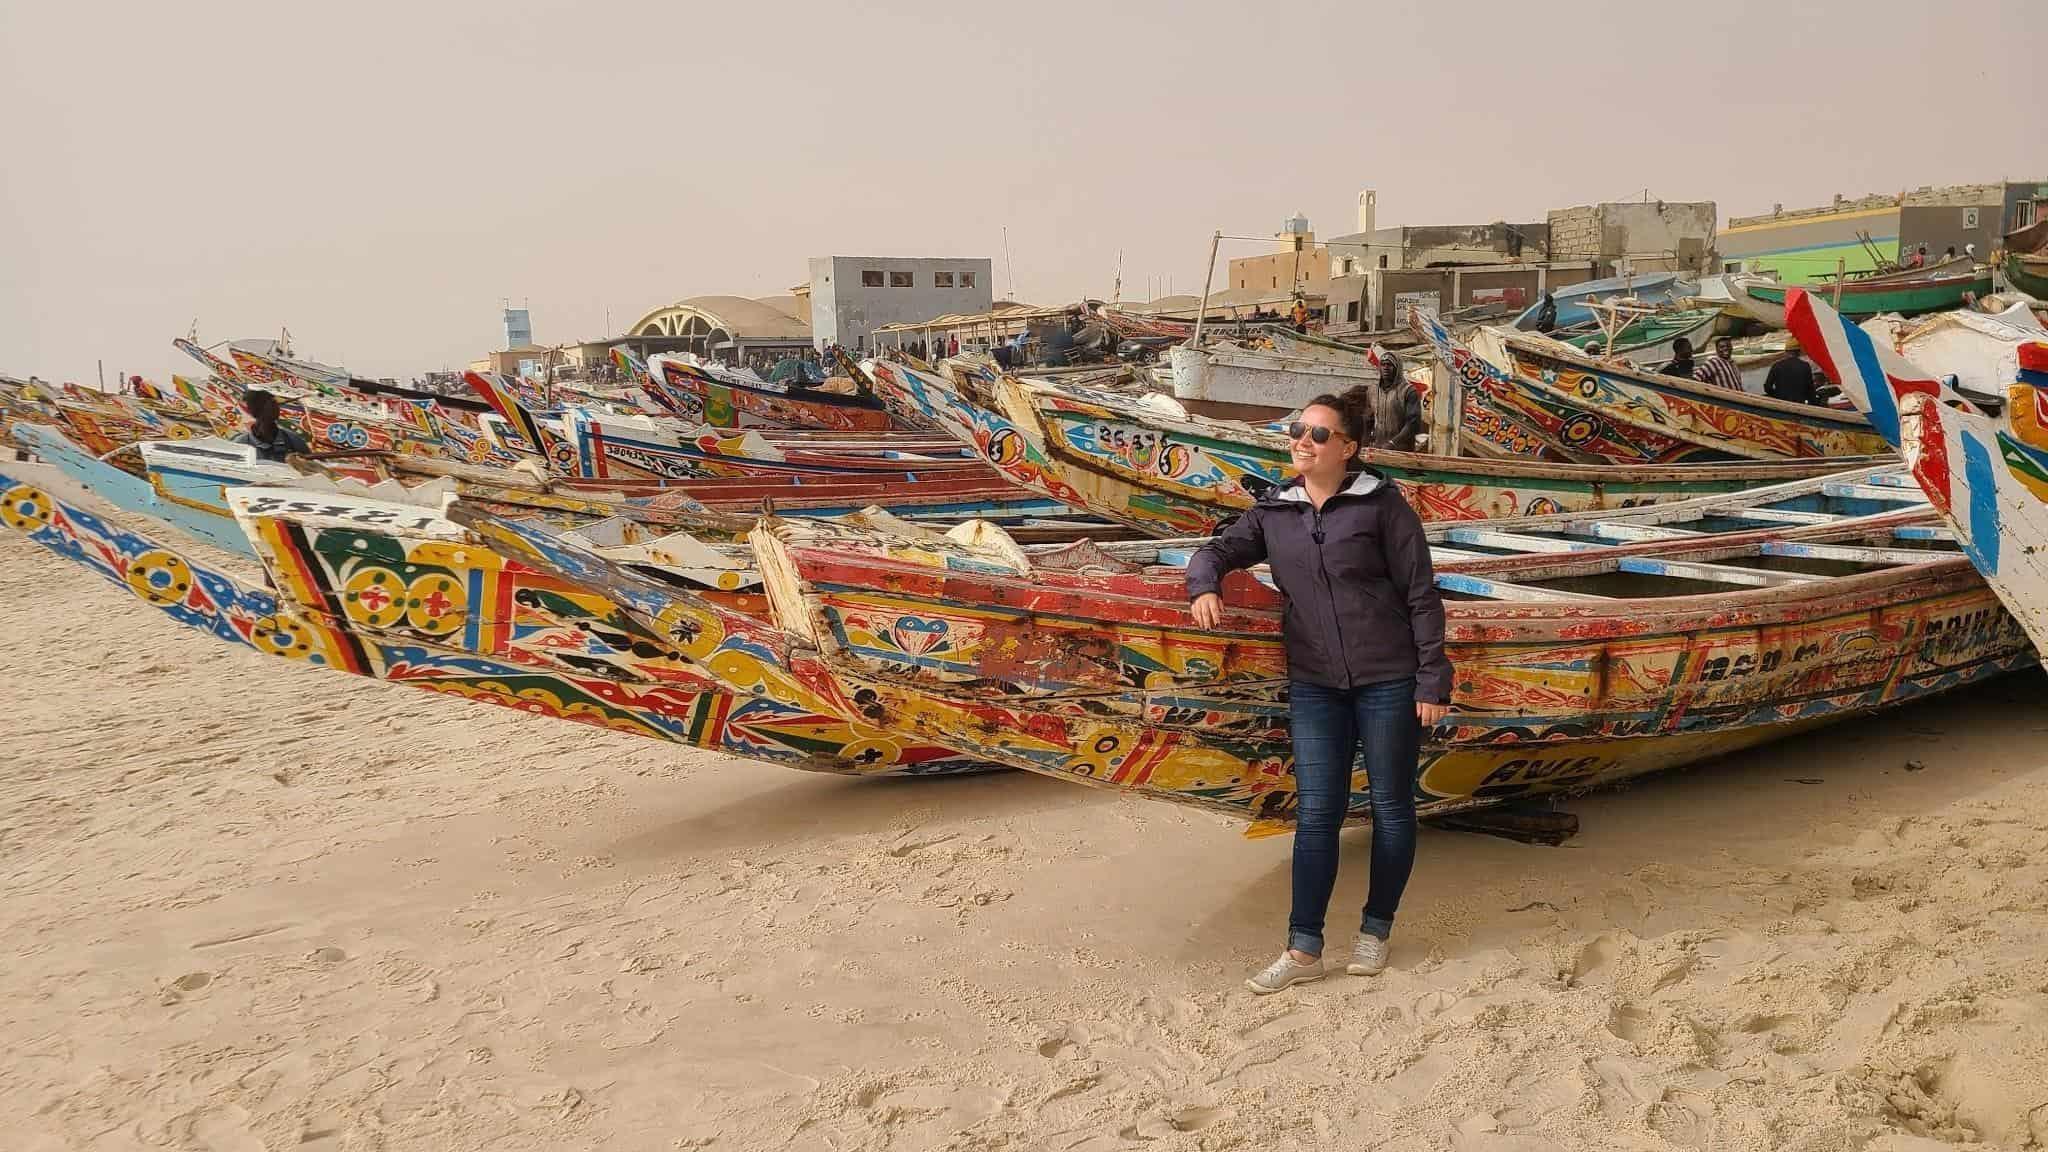 Port de Pêche, Nouakchott, Mauritania